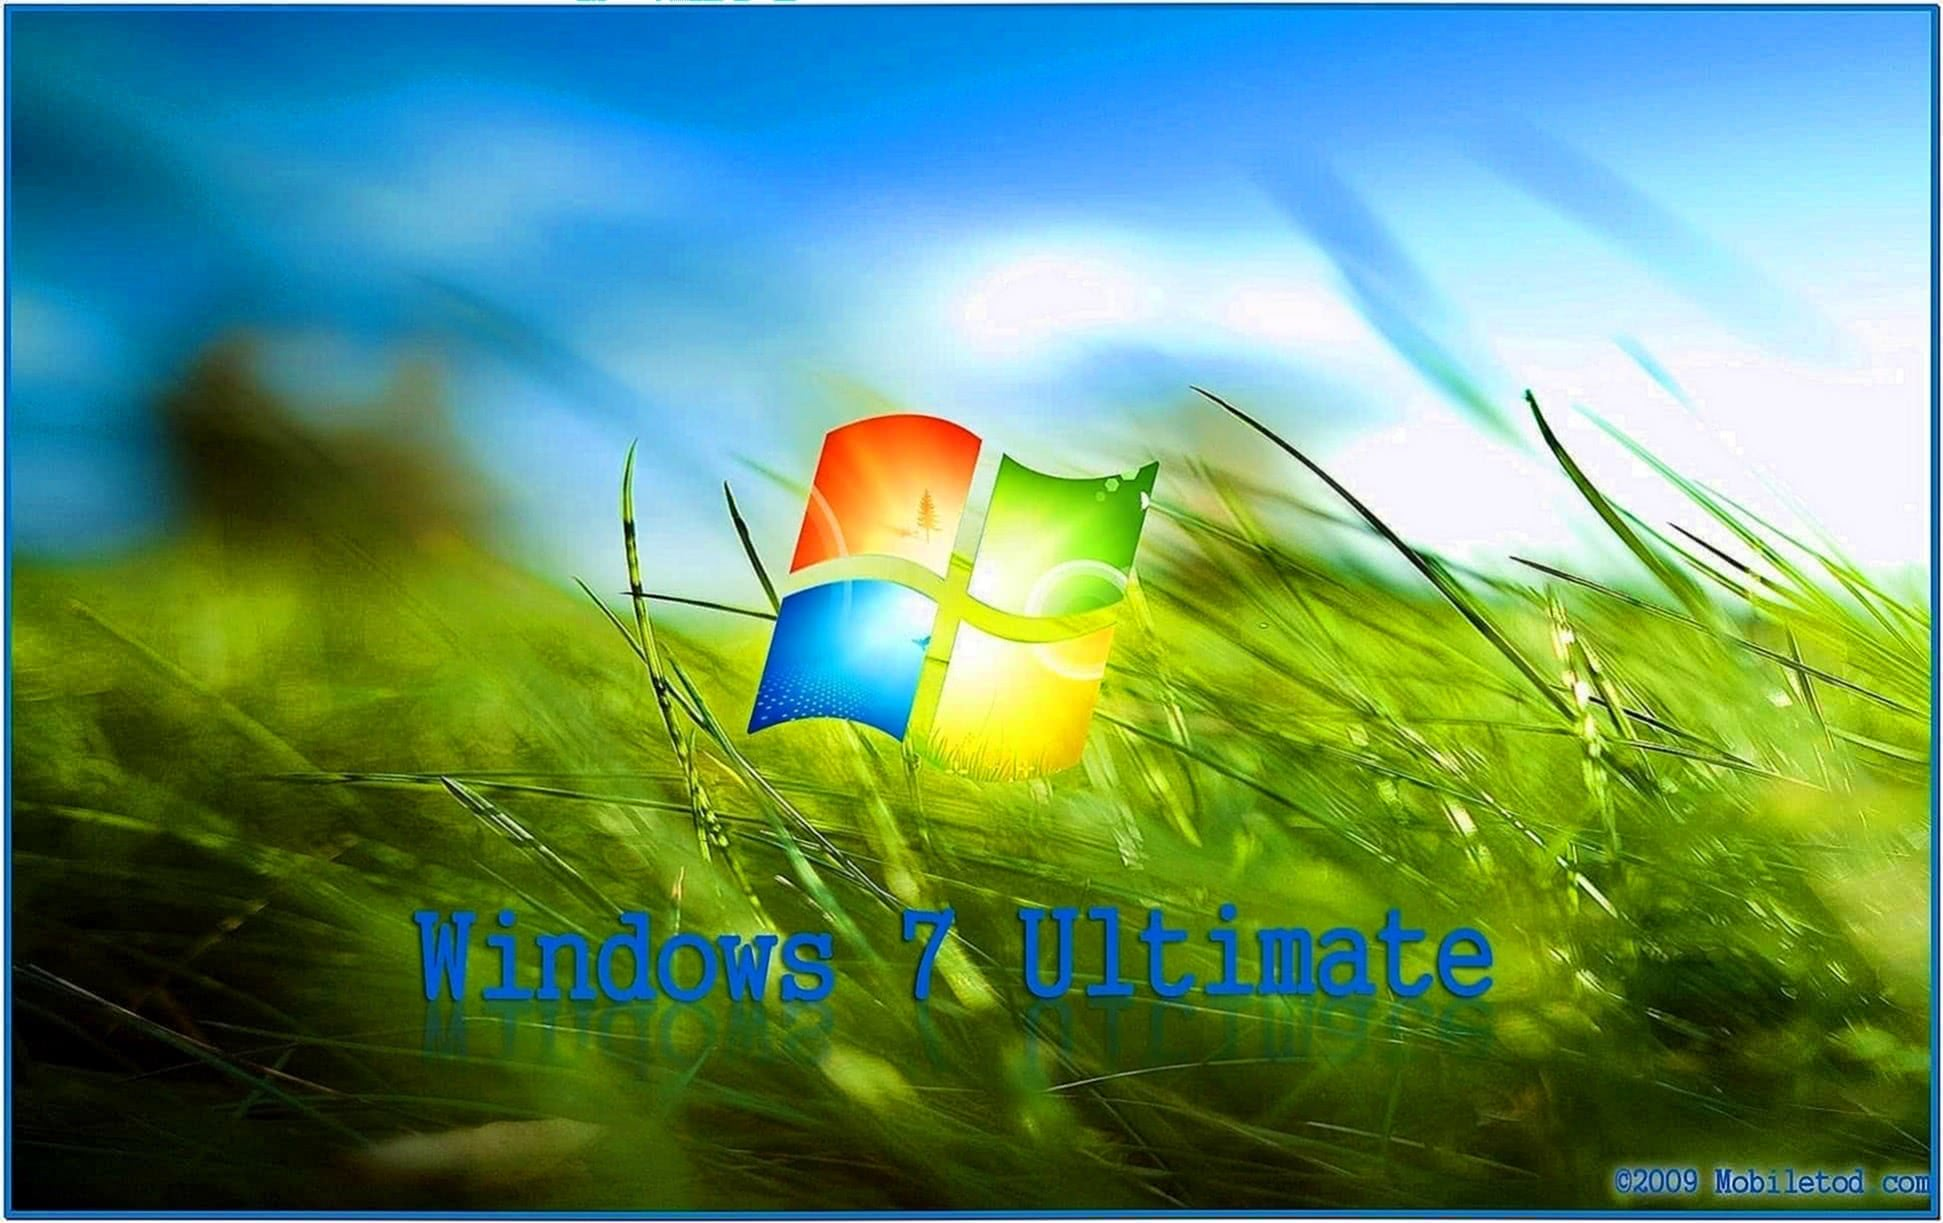 Screensavers Windows 7 Ultimate